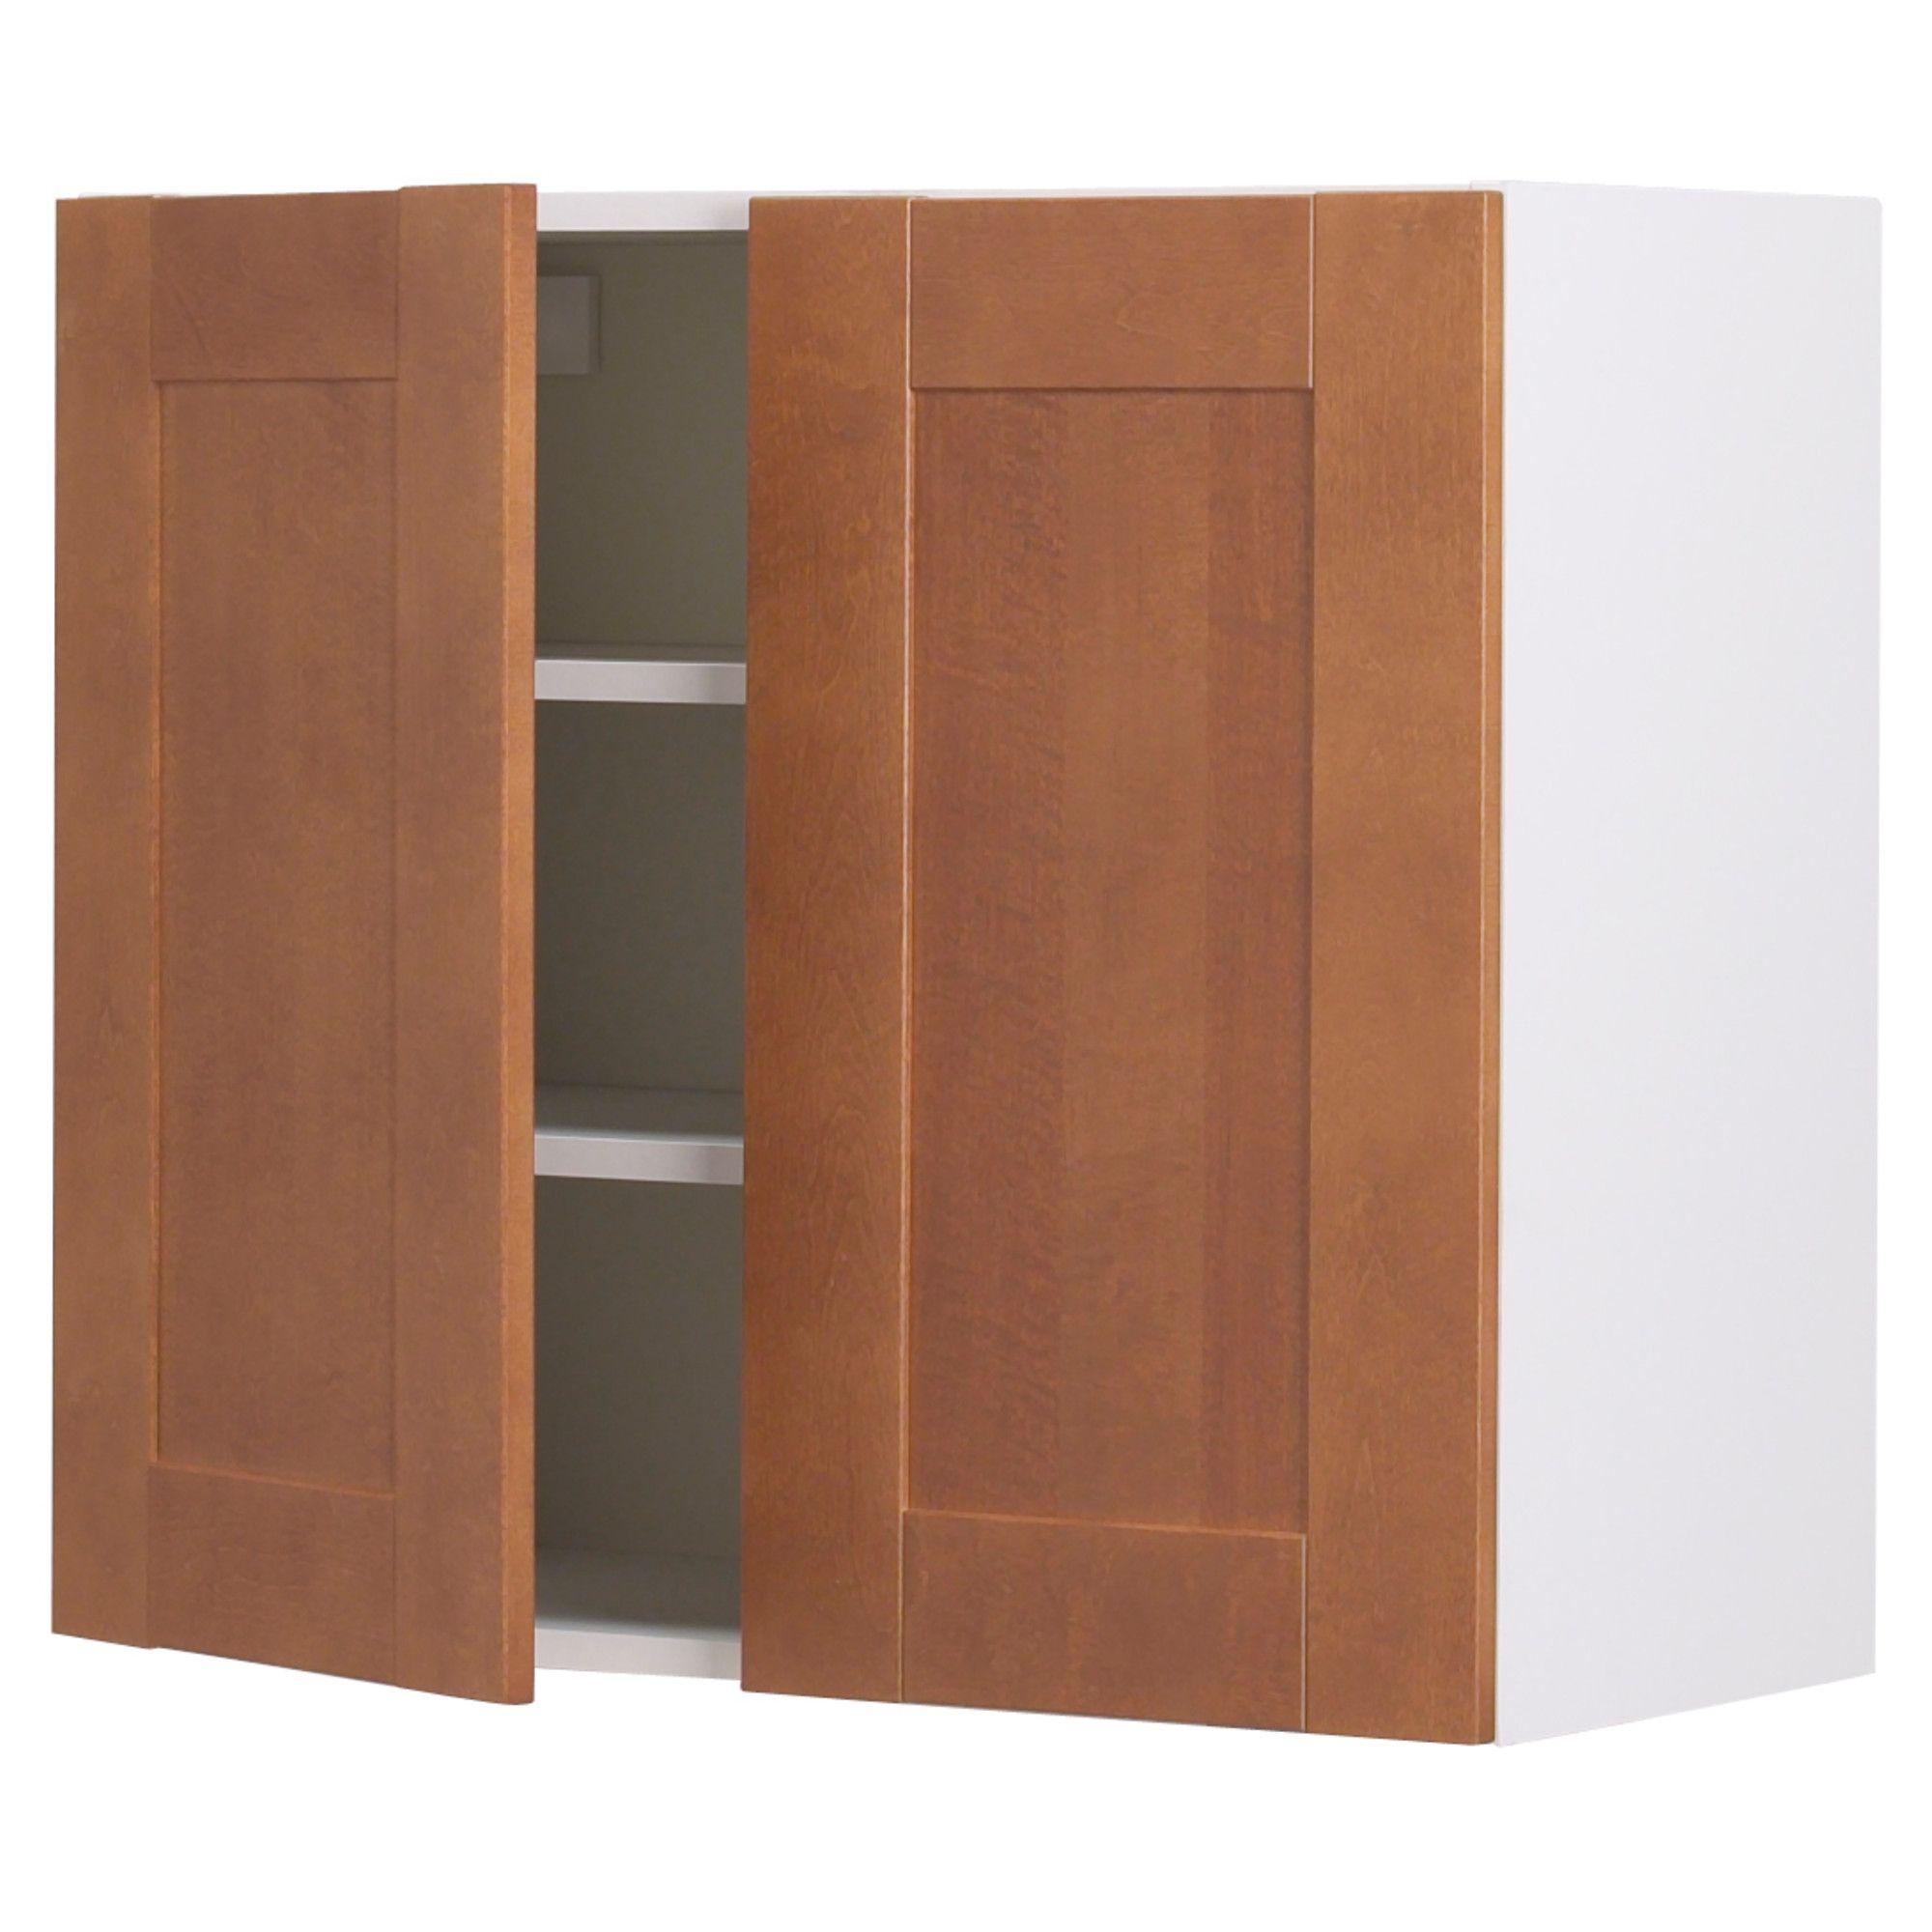 akurum wall cabinet with 2 doors white Ädel medium brown 36x39